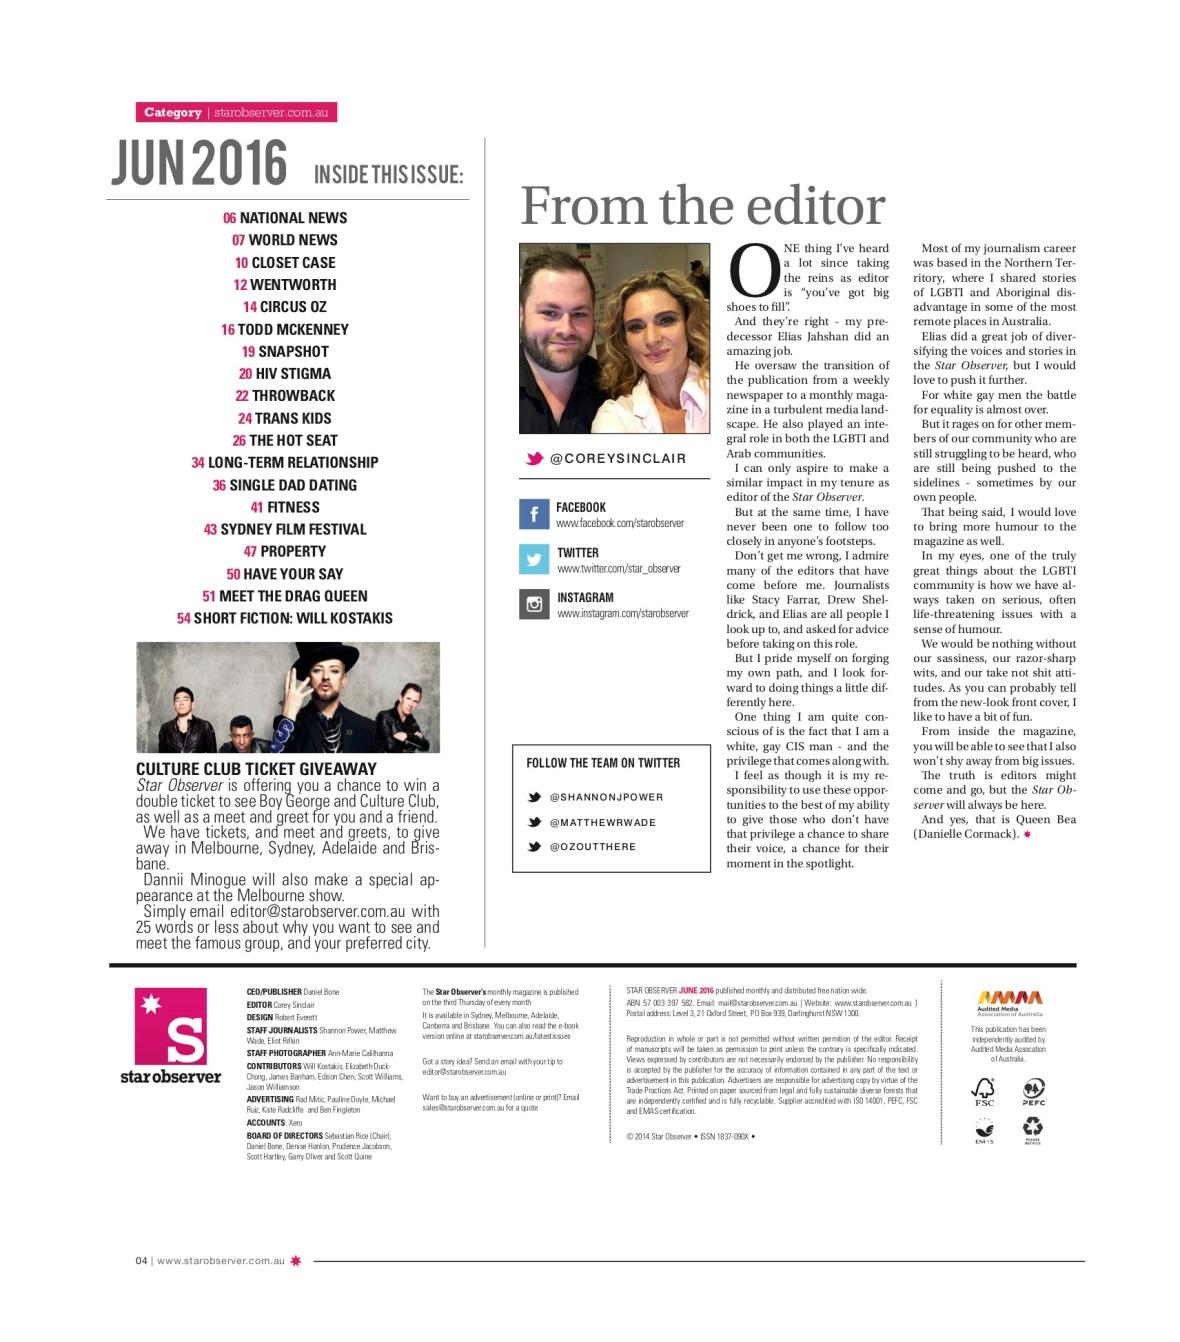 Hnnah Conda Star Observer Magazine _ June 2016 index